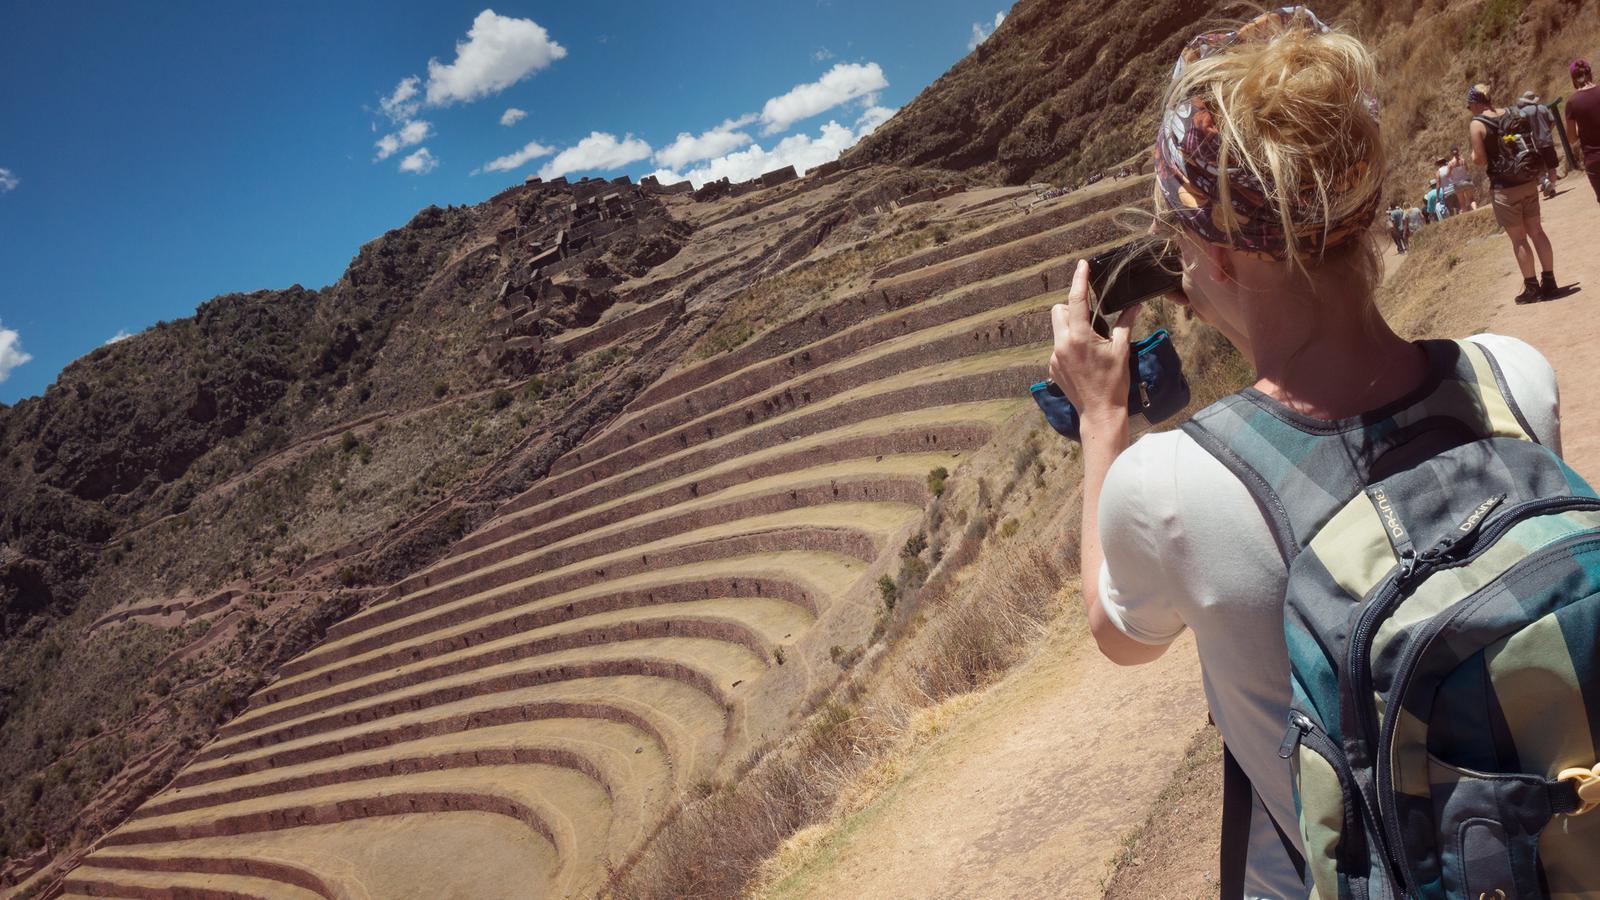 Südamerika Erlebnisreise junge Leute Ecuador Peru Bolivien preiwert reisen traveljunkies